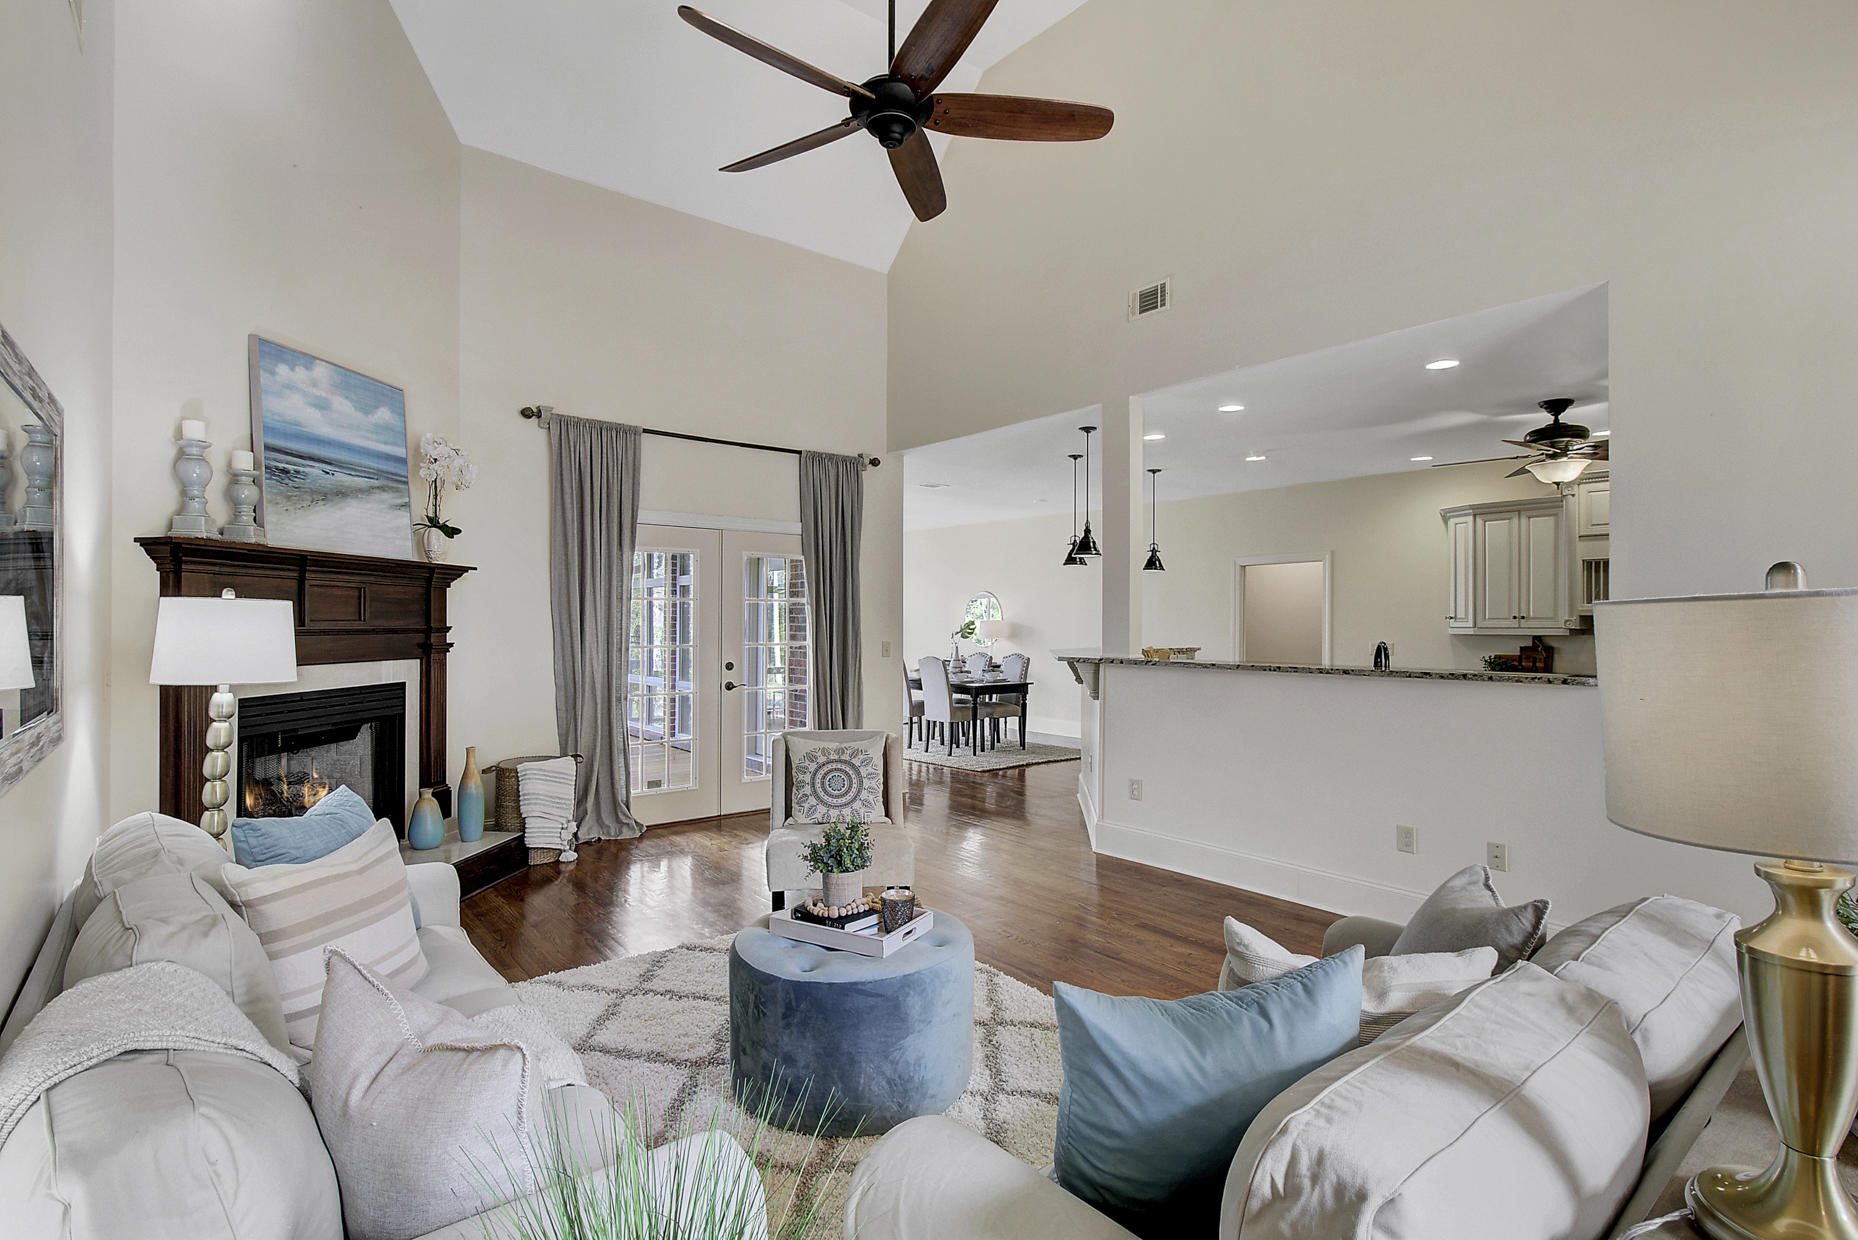 Dunes West Homes For Sale - 4123 Colonel Vanderhorst, Mount Pleasant, SC - 21